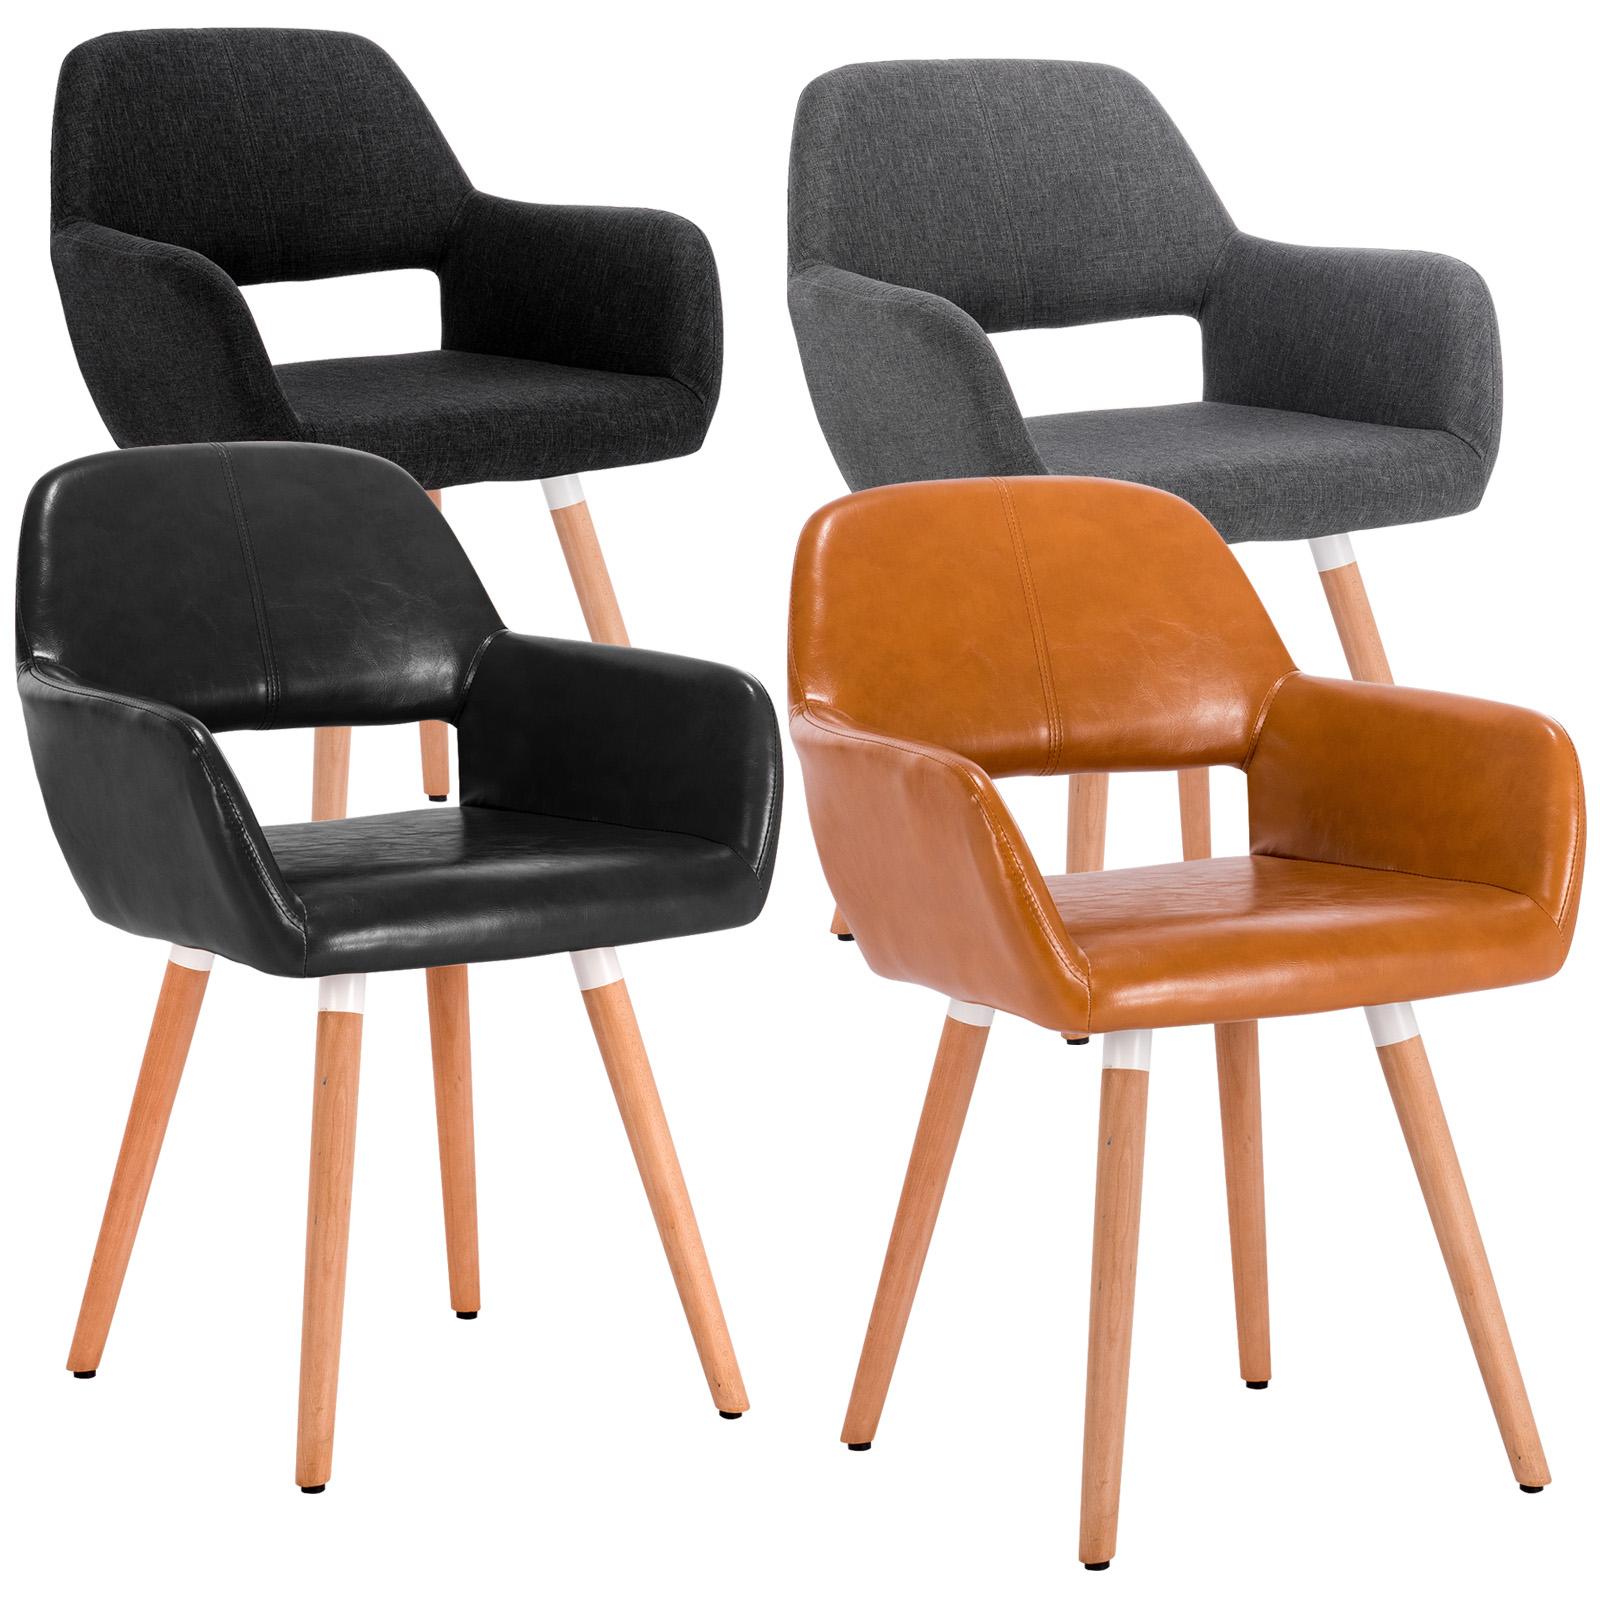 Esszimmerstuhl Design Stuhl Küchenstuhl Lehnstuhl Polsterstuhl Holz 800 24   eBay